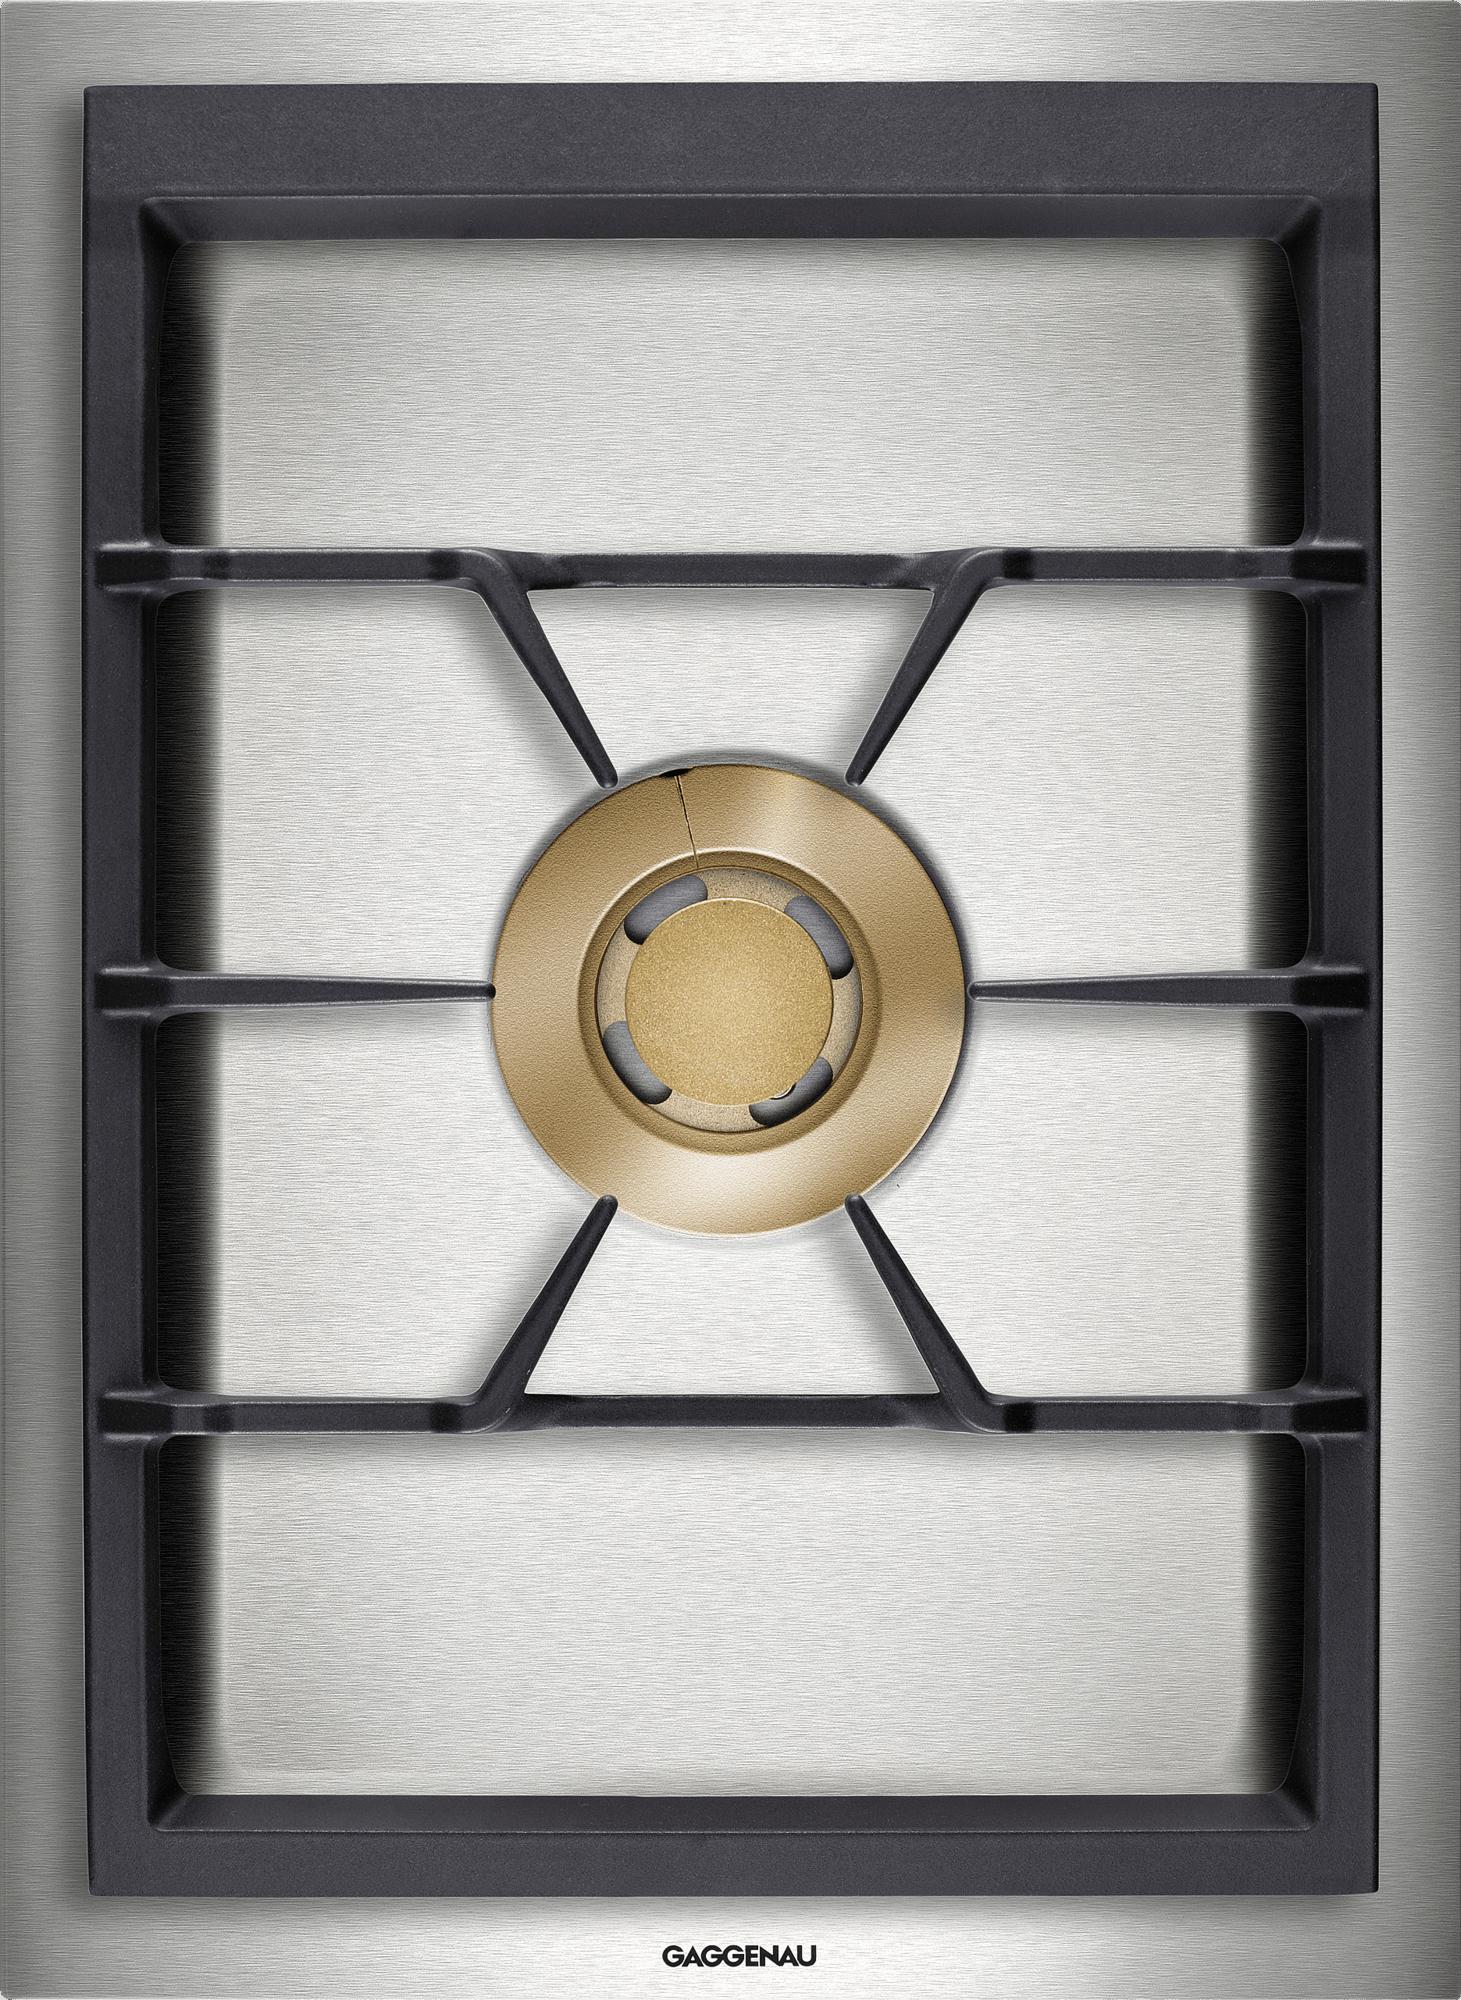 Золотая лихорадка: техника и декор в цвете золота (галерея 4, фото 4)